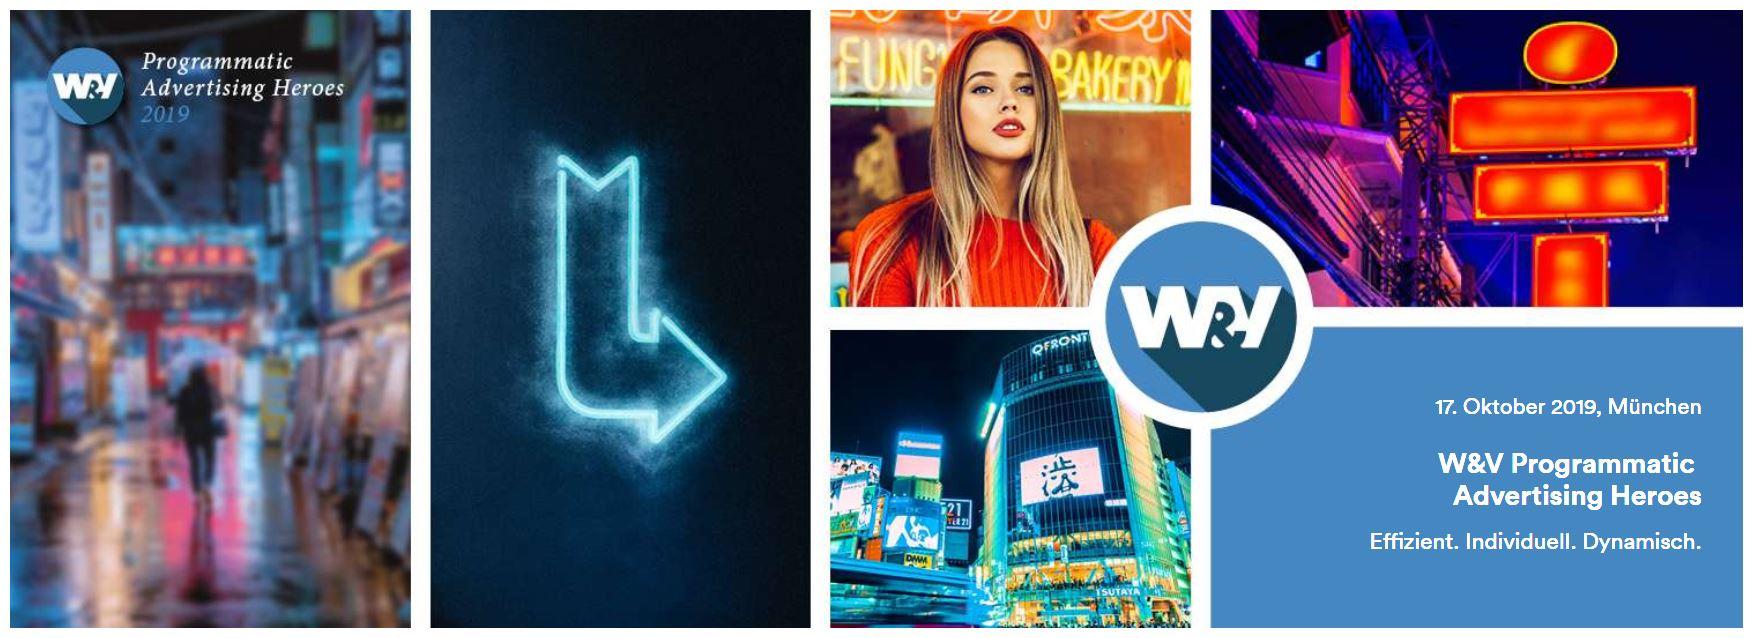 W&V Programmatic Advertising Heroes 2019